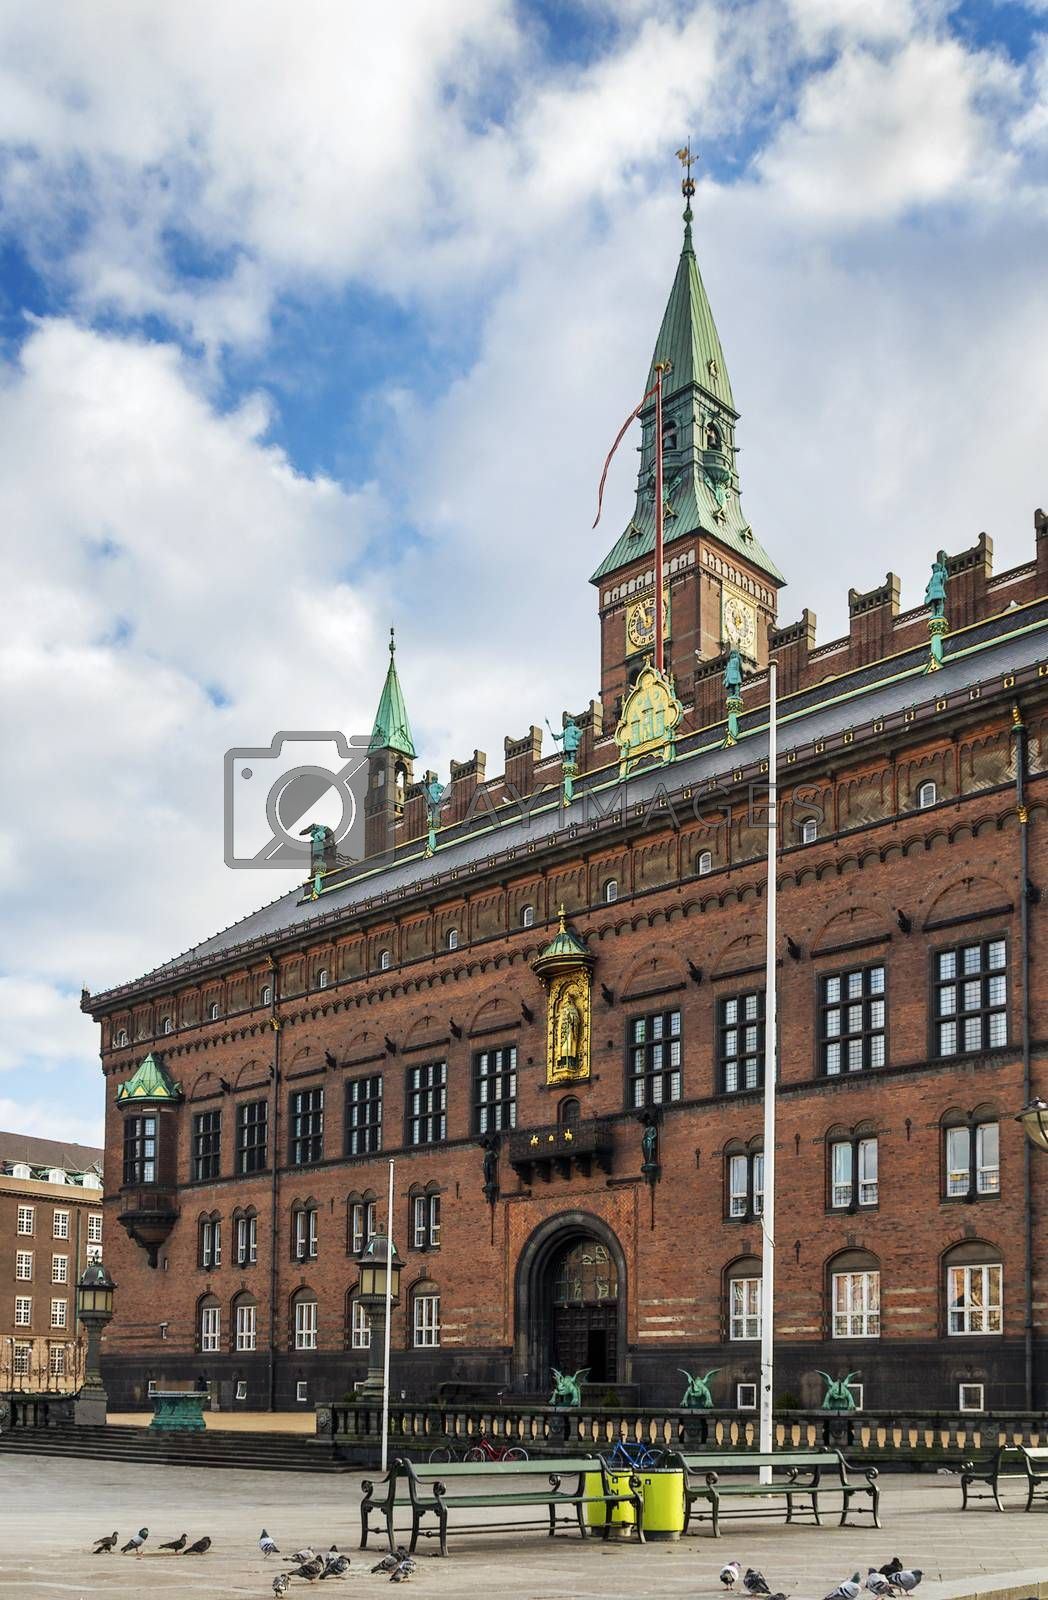 Copenhagen City Hall by borisb17